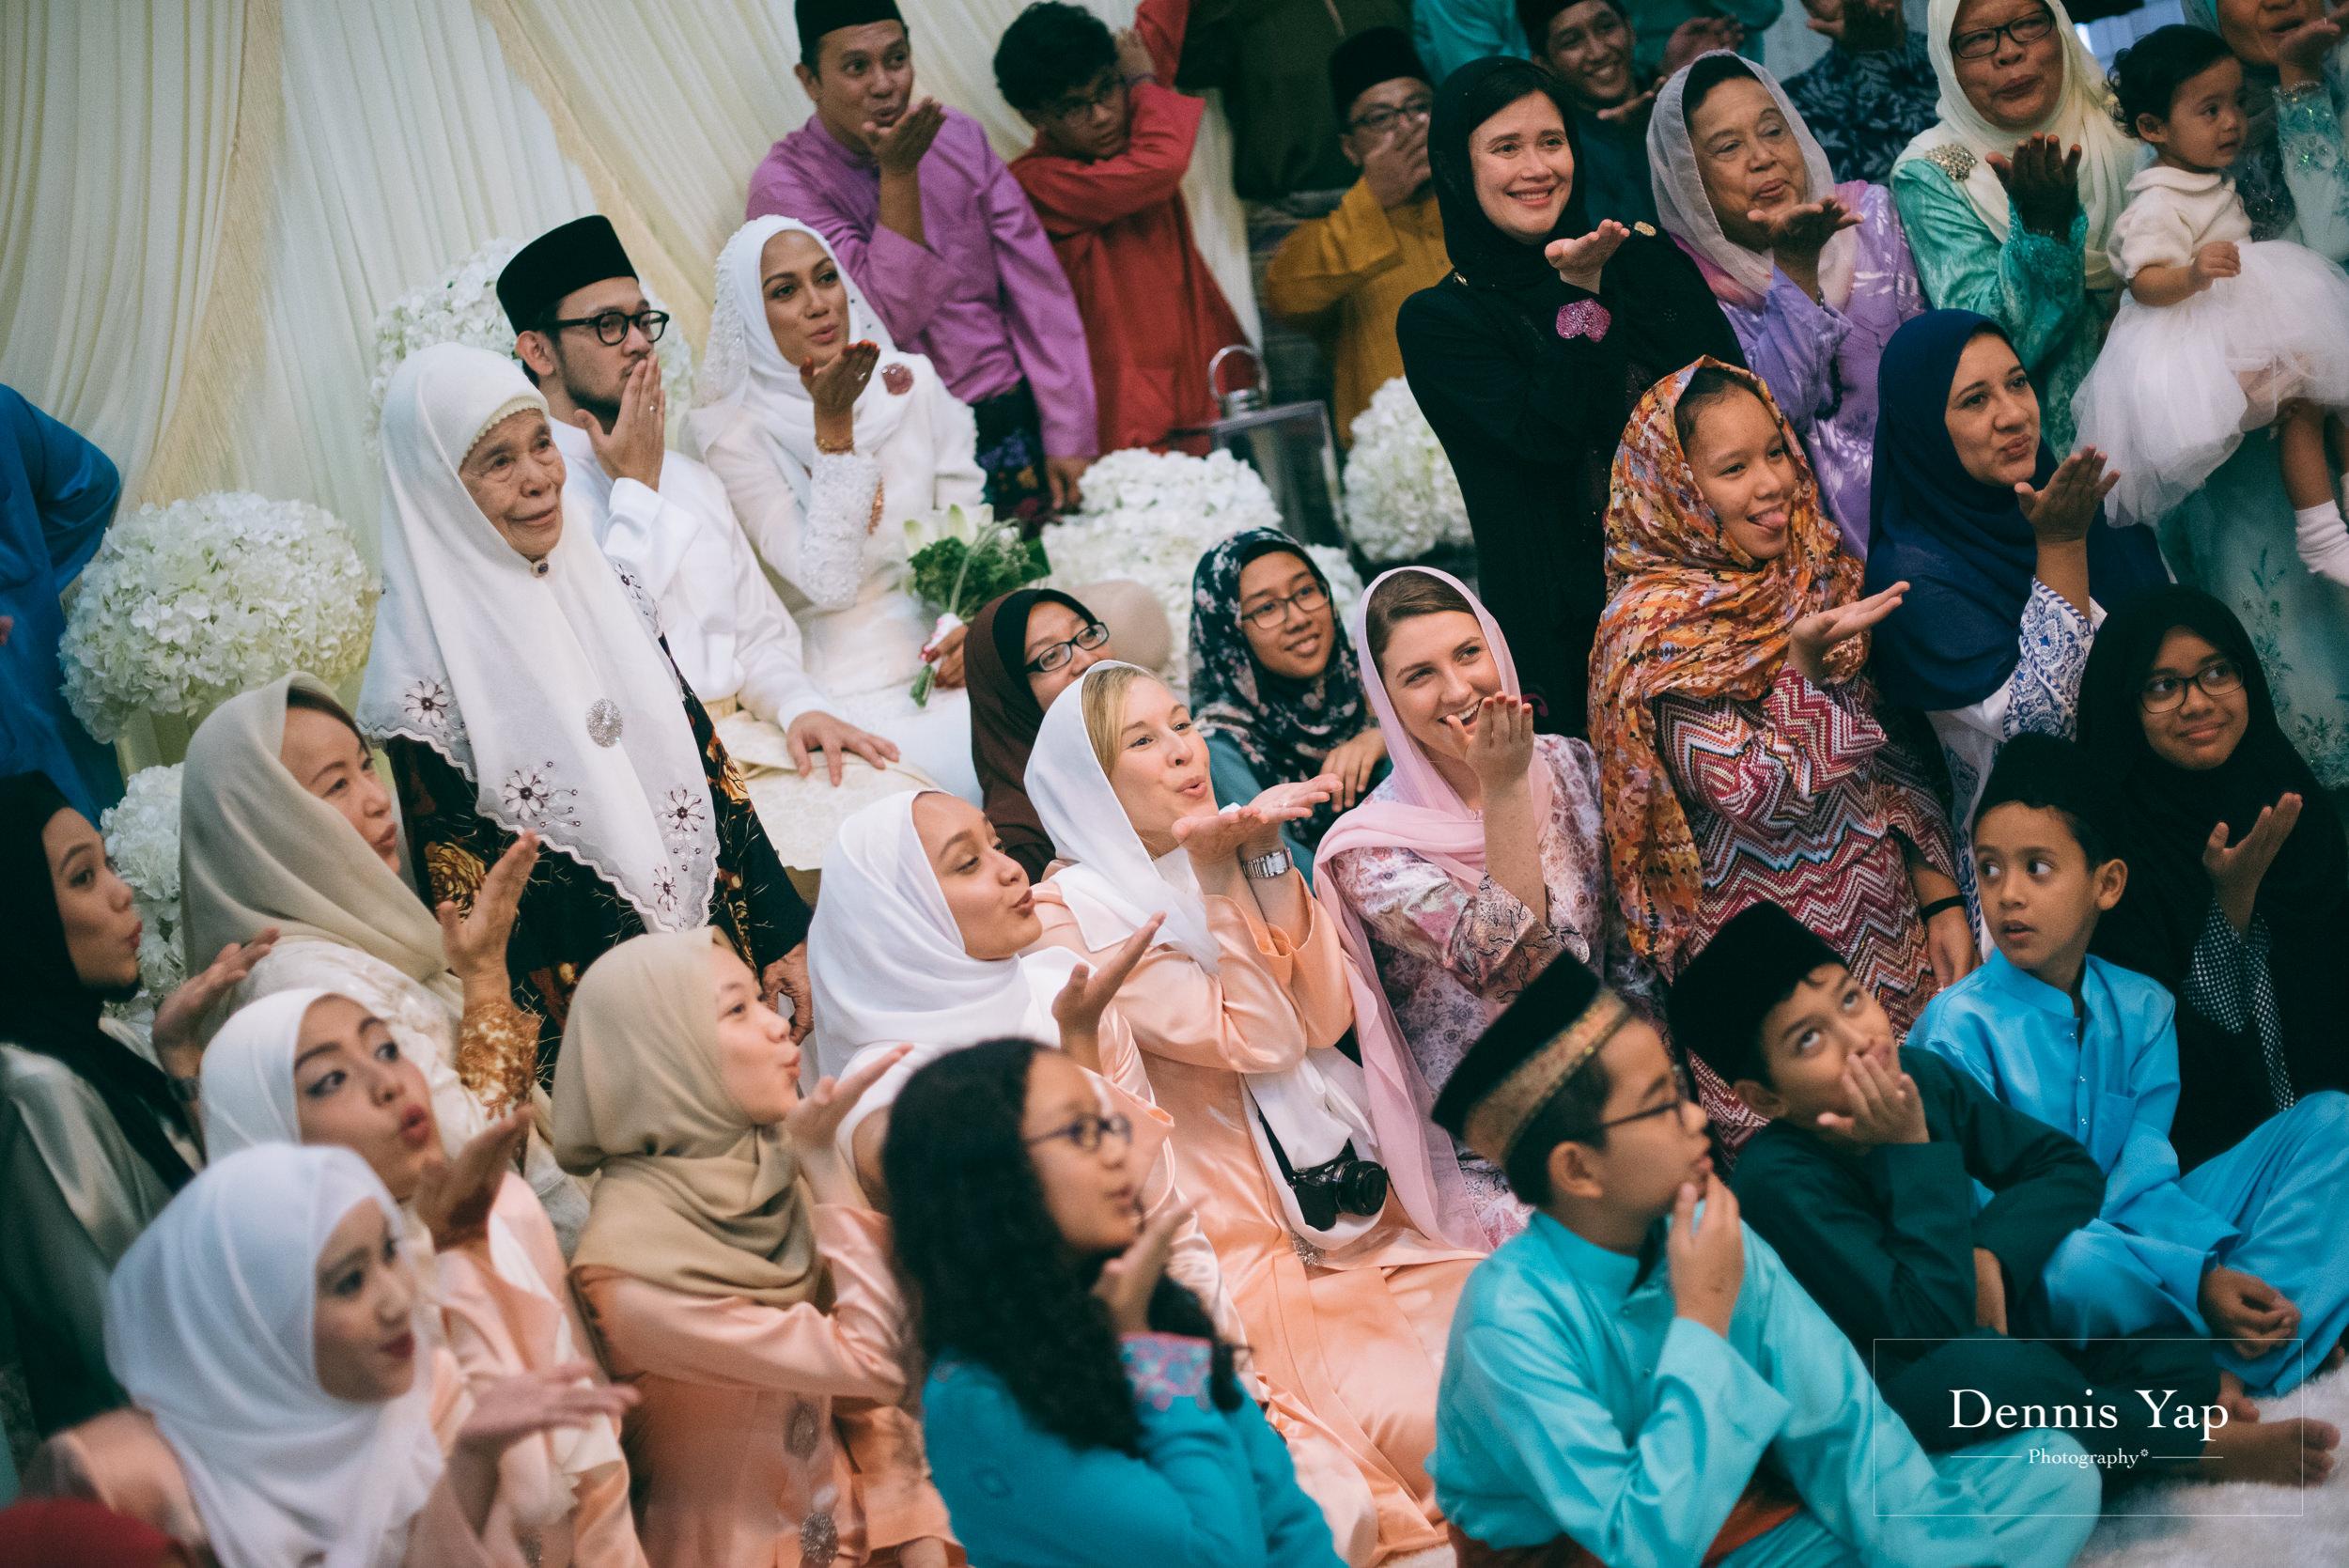 zarif hanalili malay wedding ceremony dennis yap photography-22.jpg